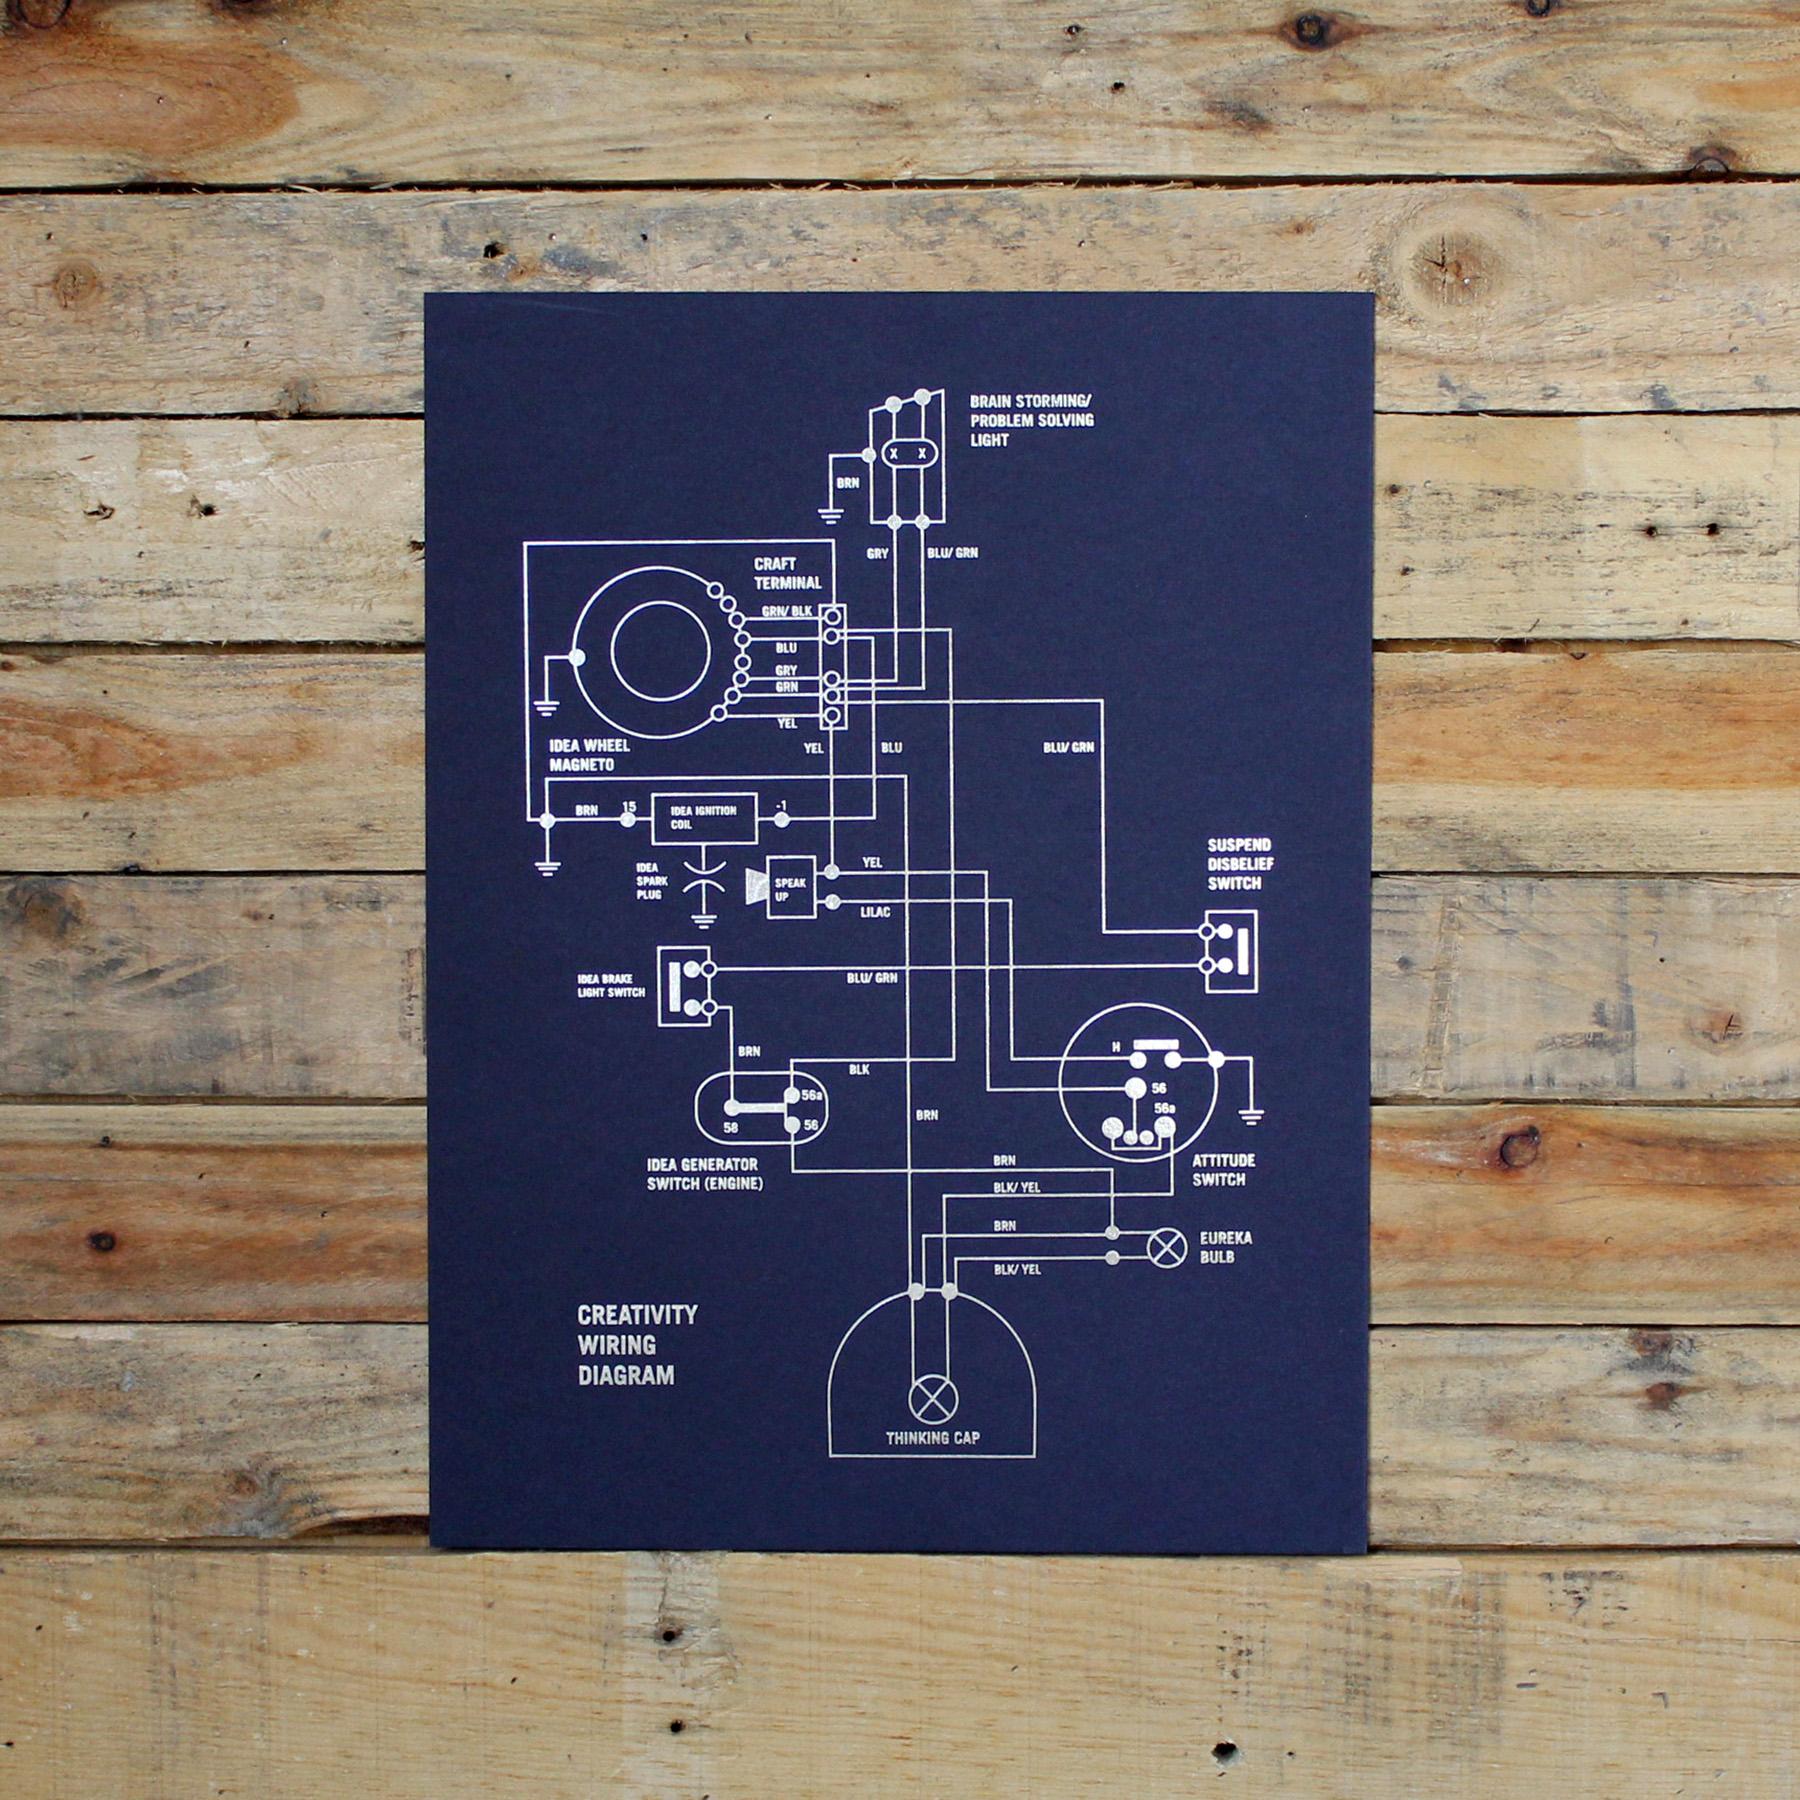 hight resolution of creativity wiring diagram vincent lai prev next